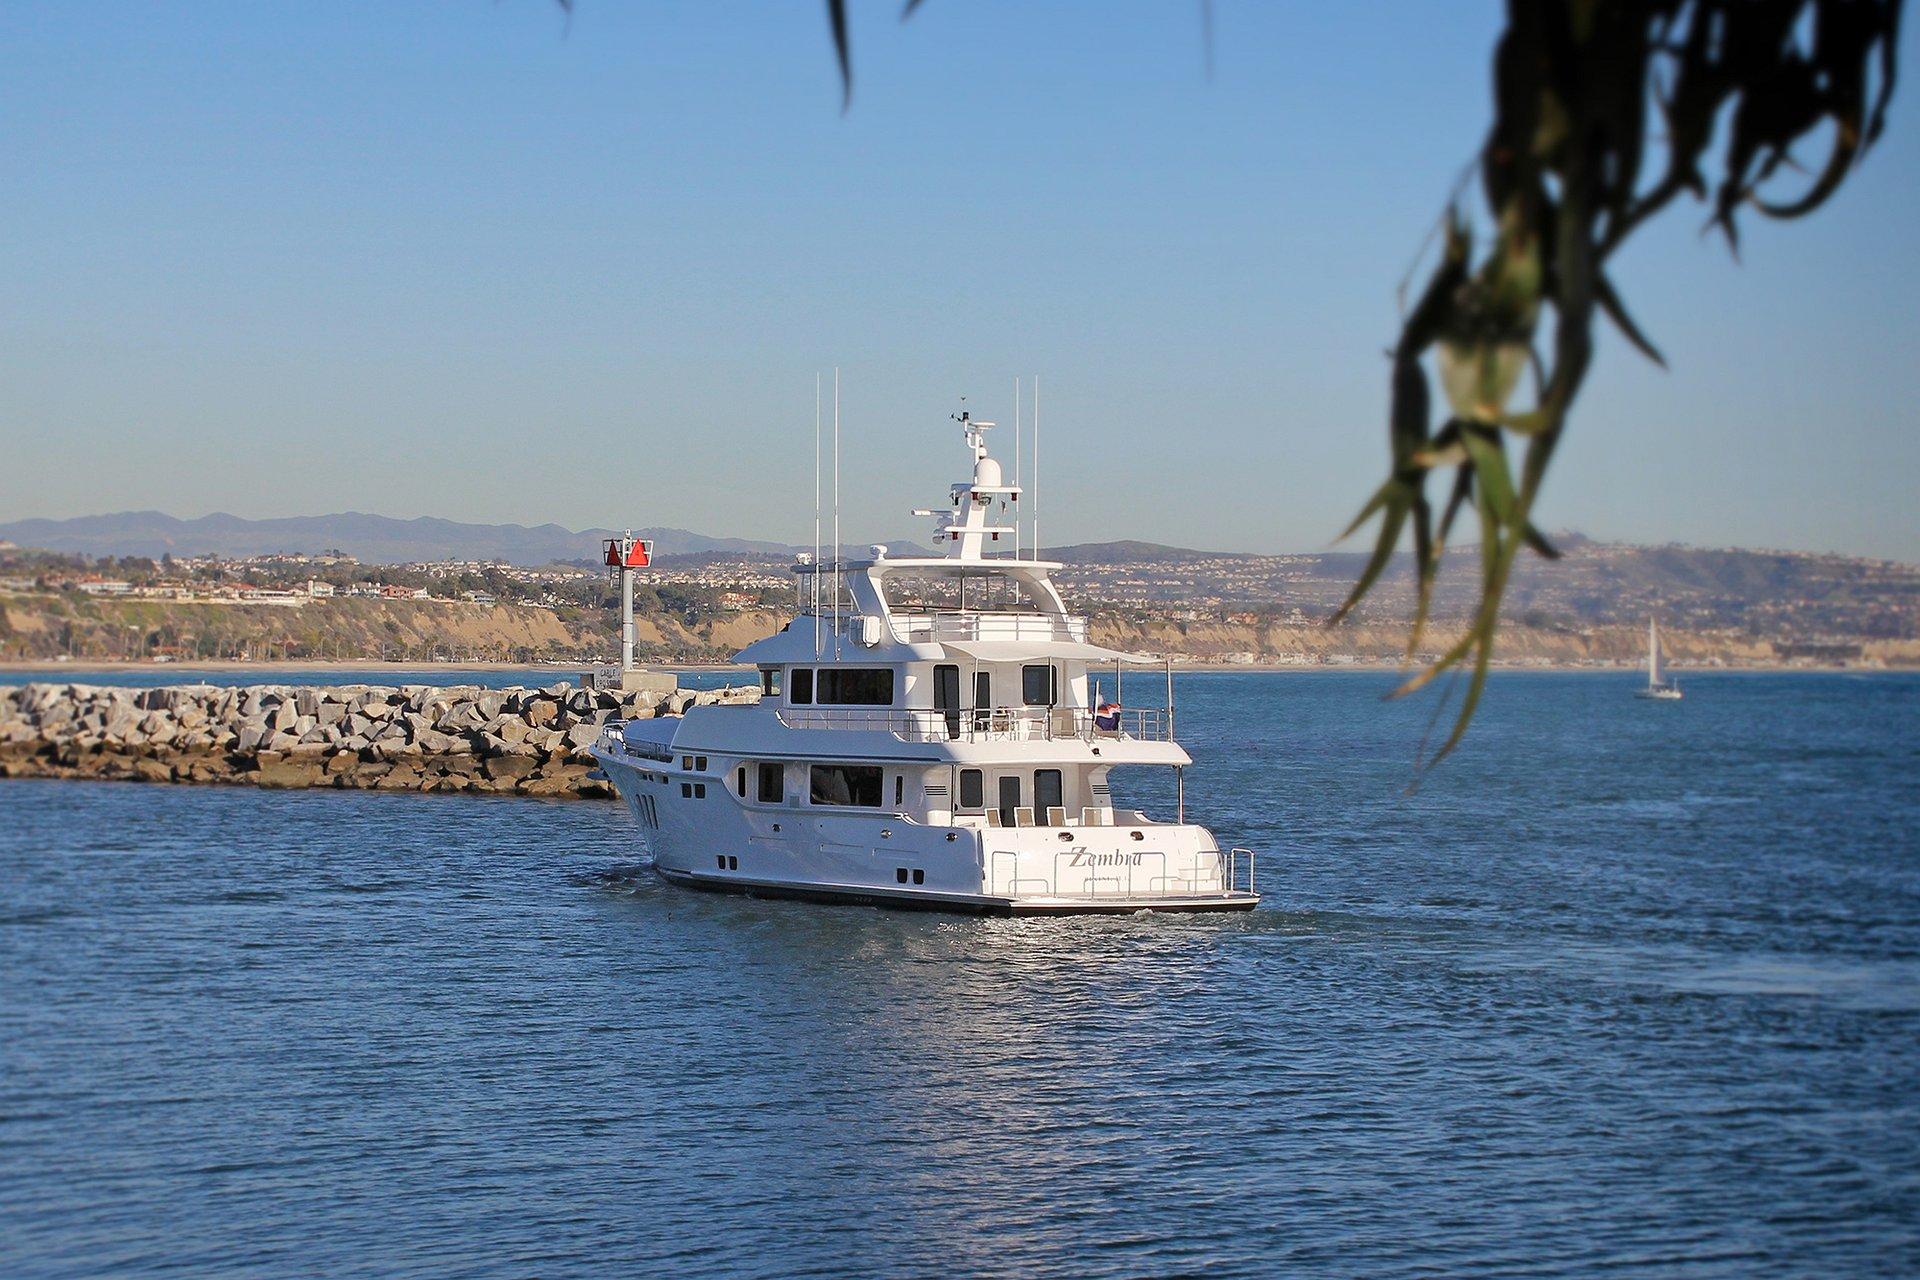 Nordhavn Tugg 'Zembra' / Dana Point California Boat Transom Lettering